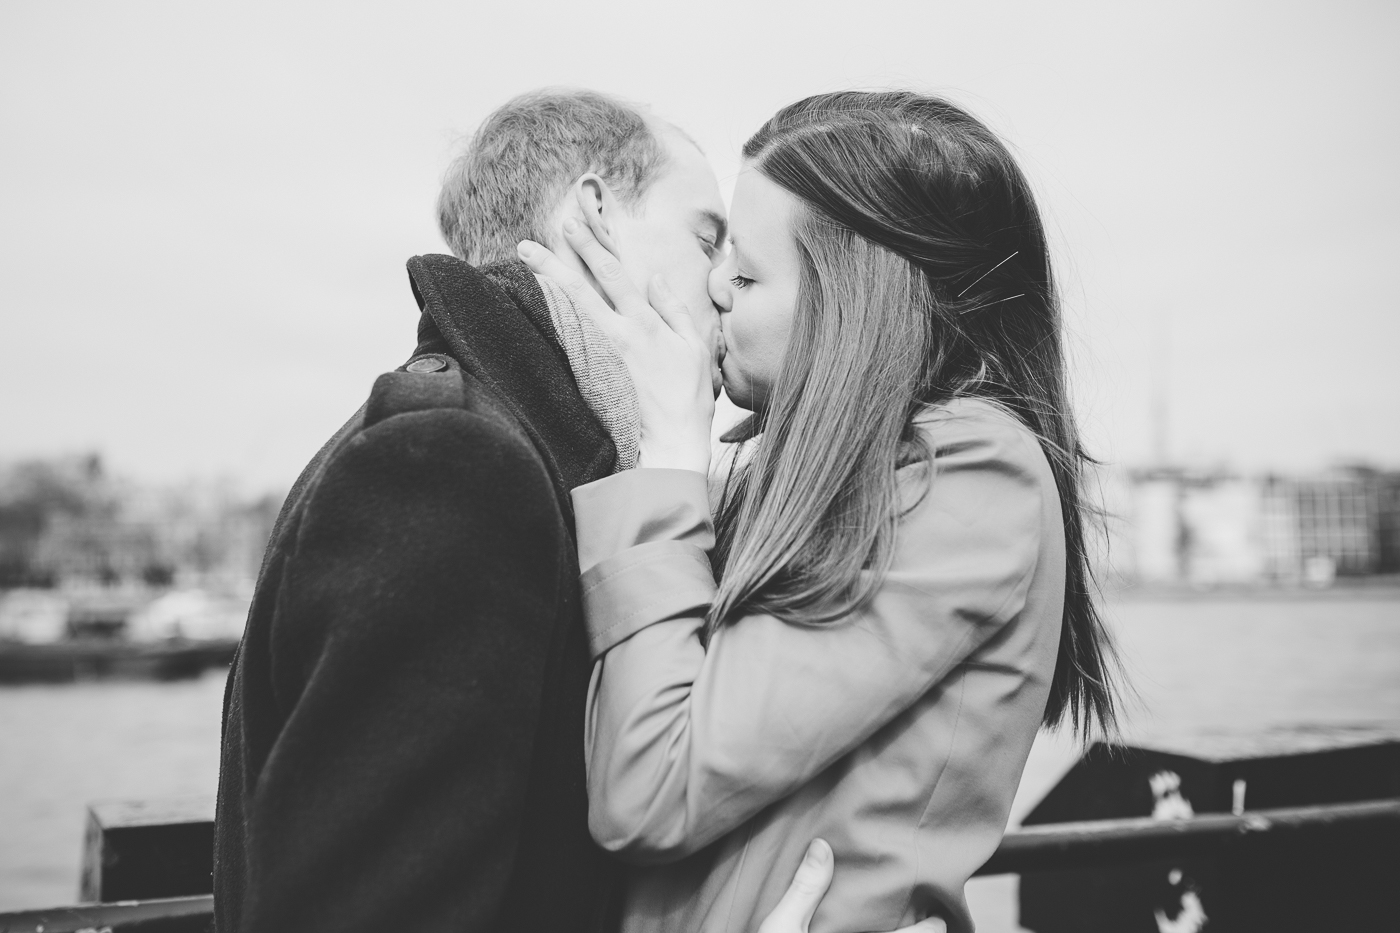 london-wedding-photographer-kate-gray-18.jpg